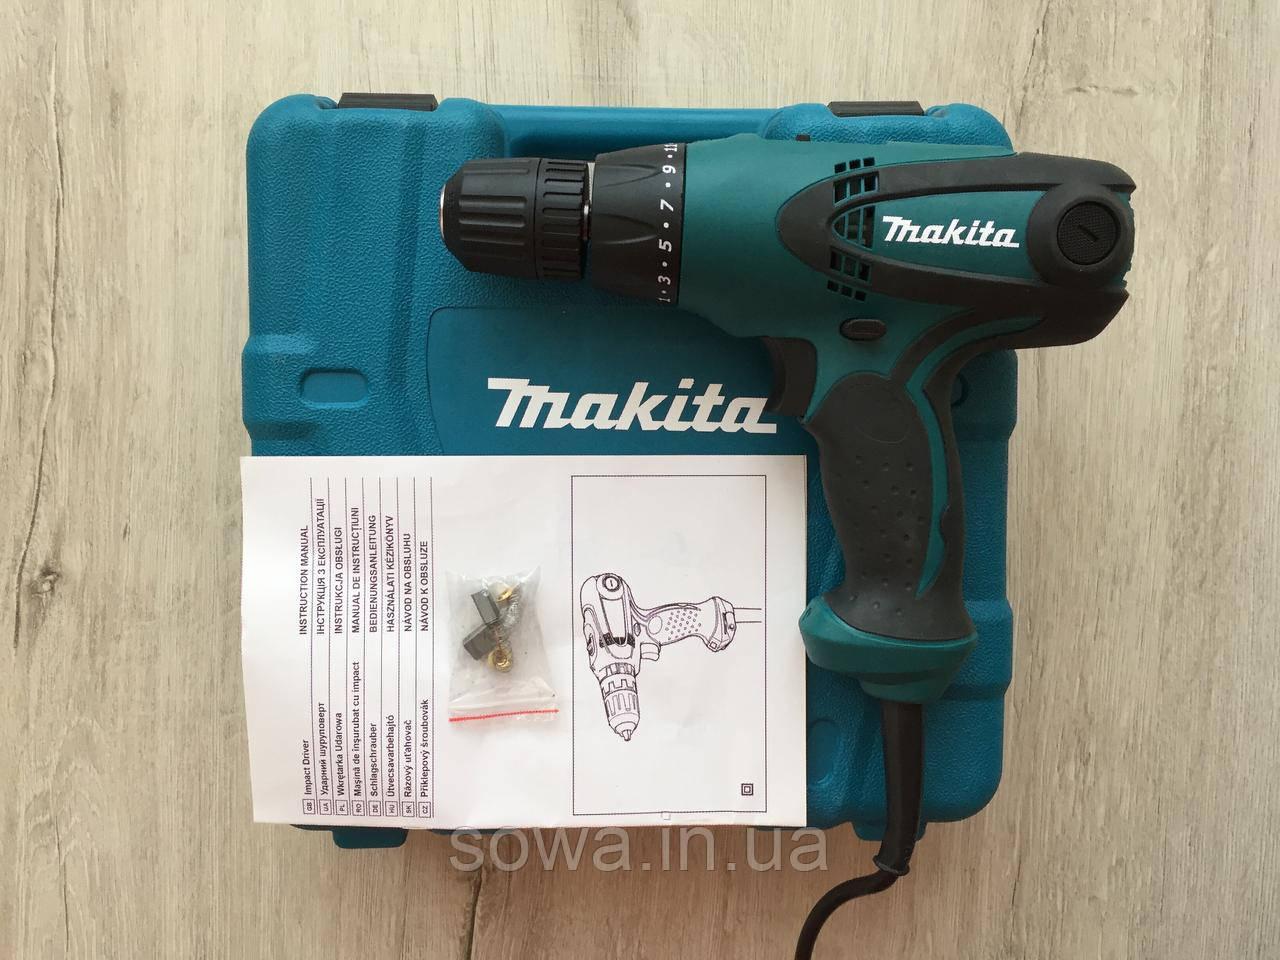 ✔️ Сетевой шуруповерт Makita _ МакитаTD0101F